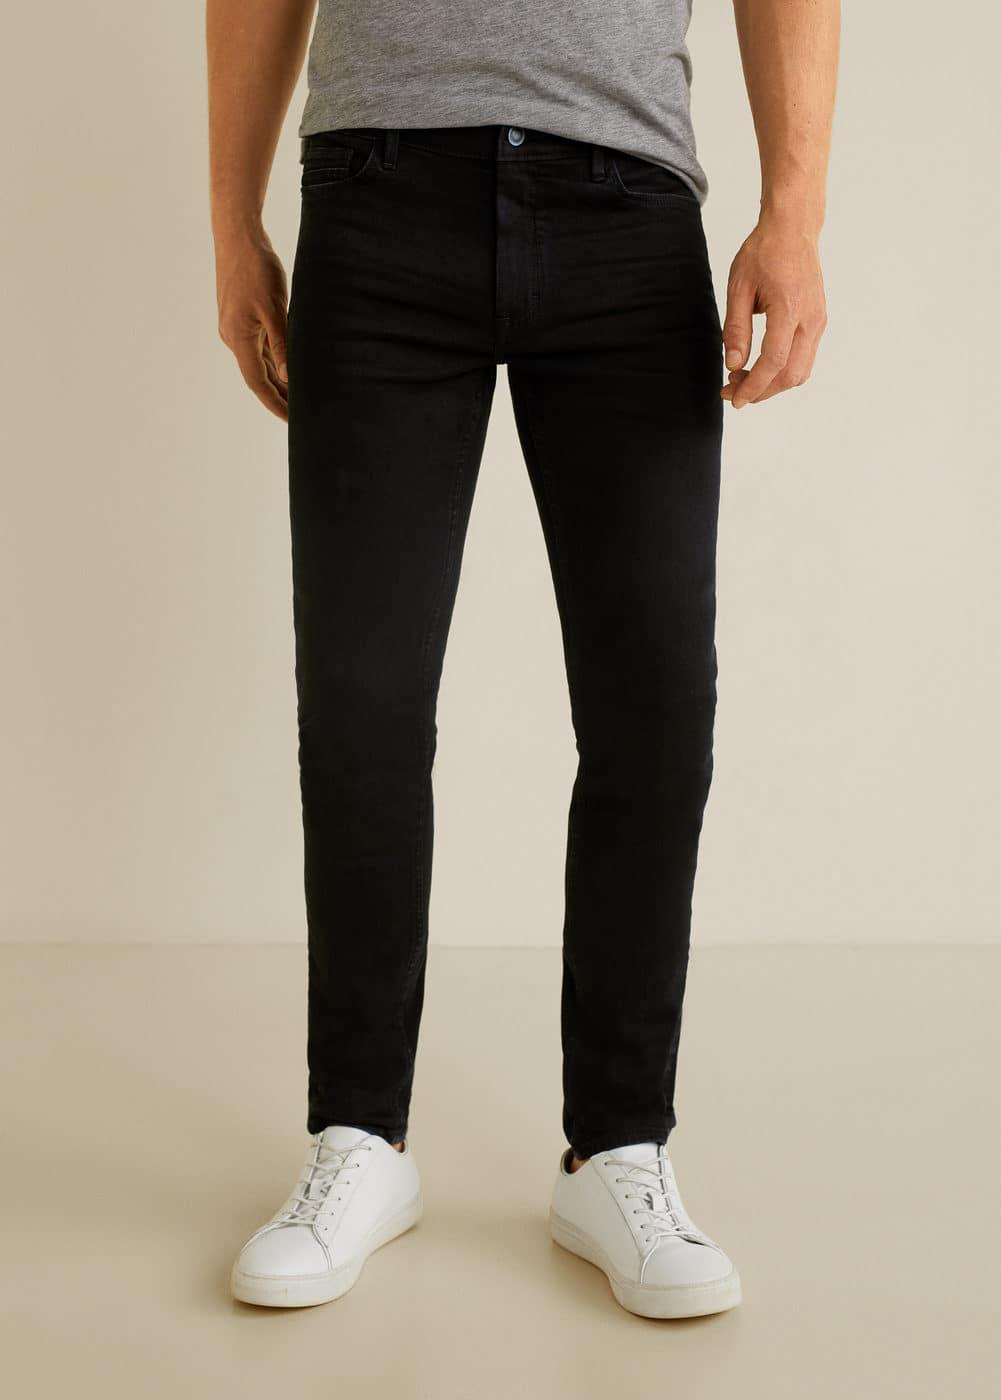 h-jude5:jeans jude skinny negros